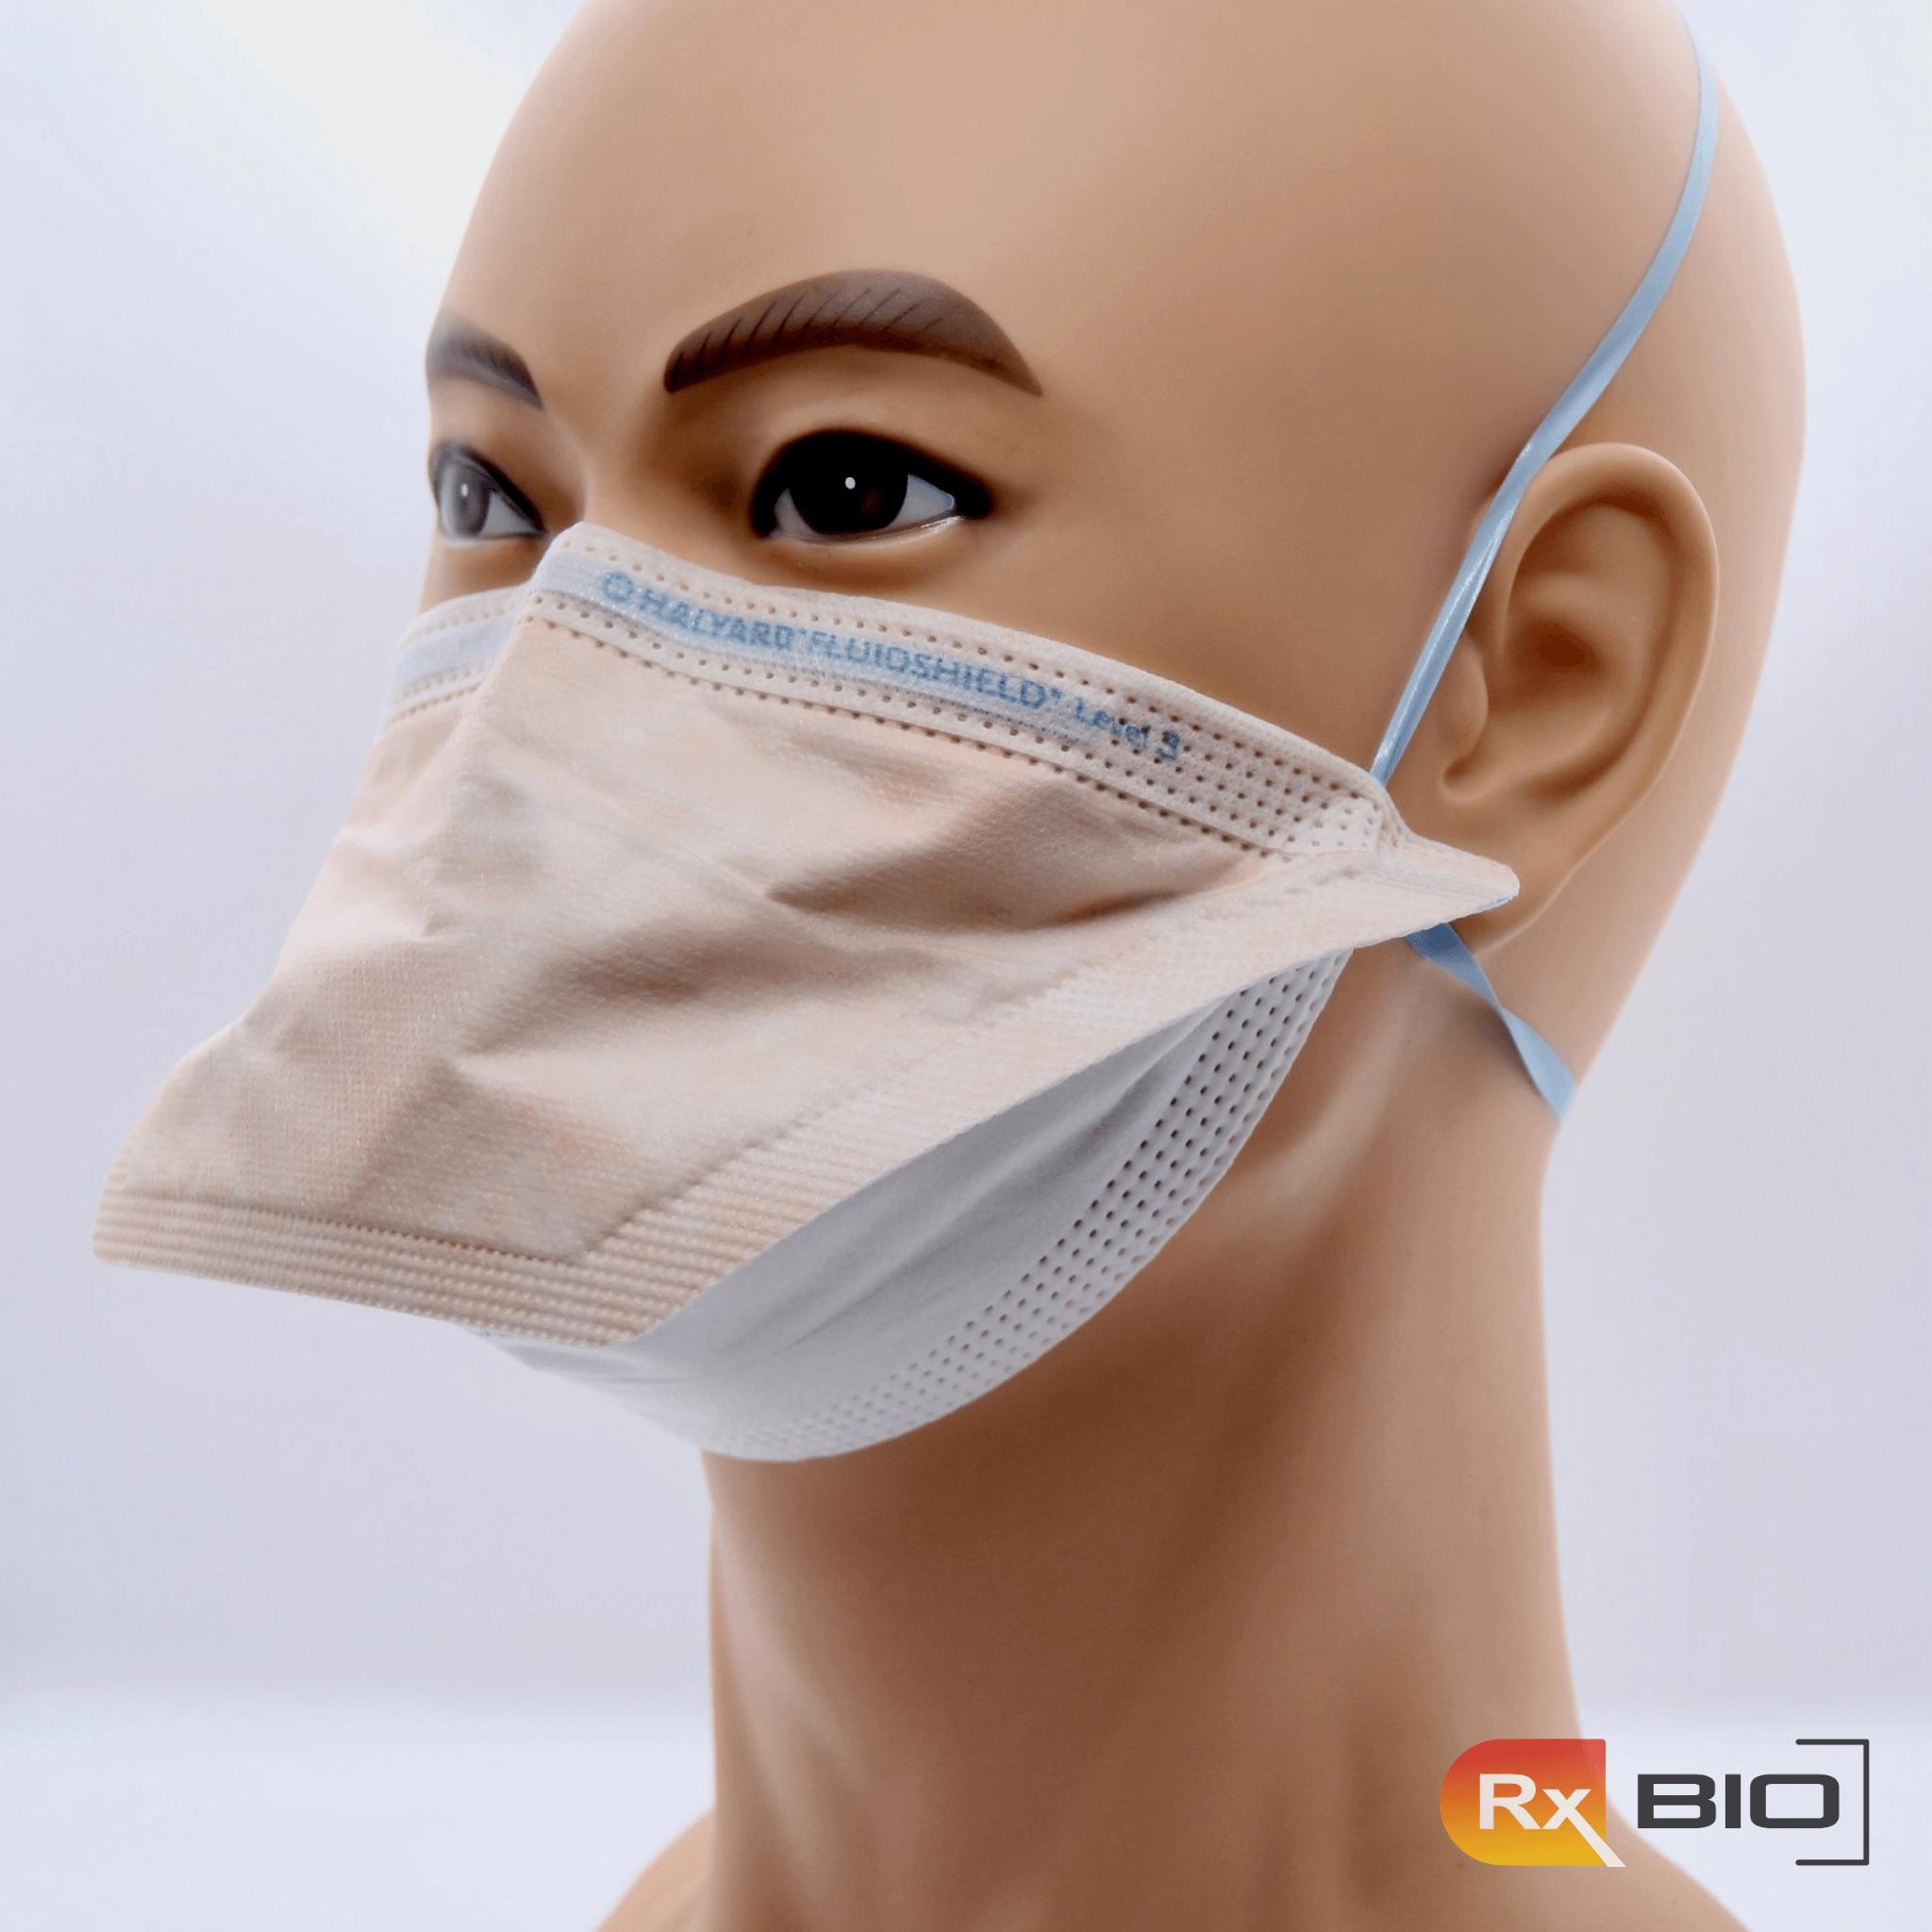 Halyard N95 Mask